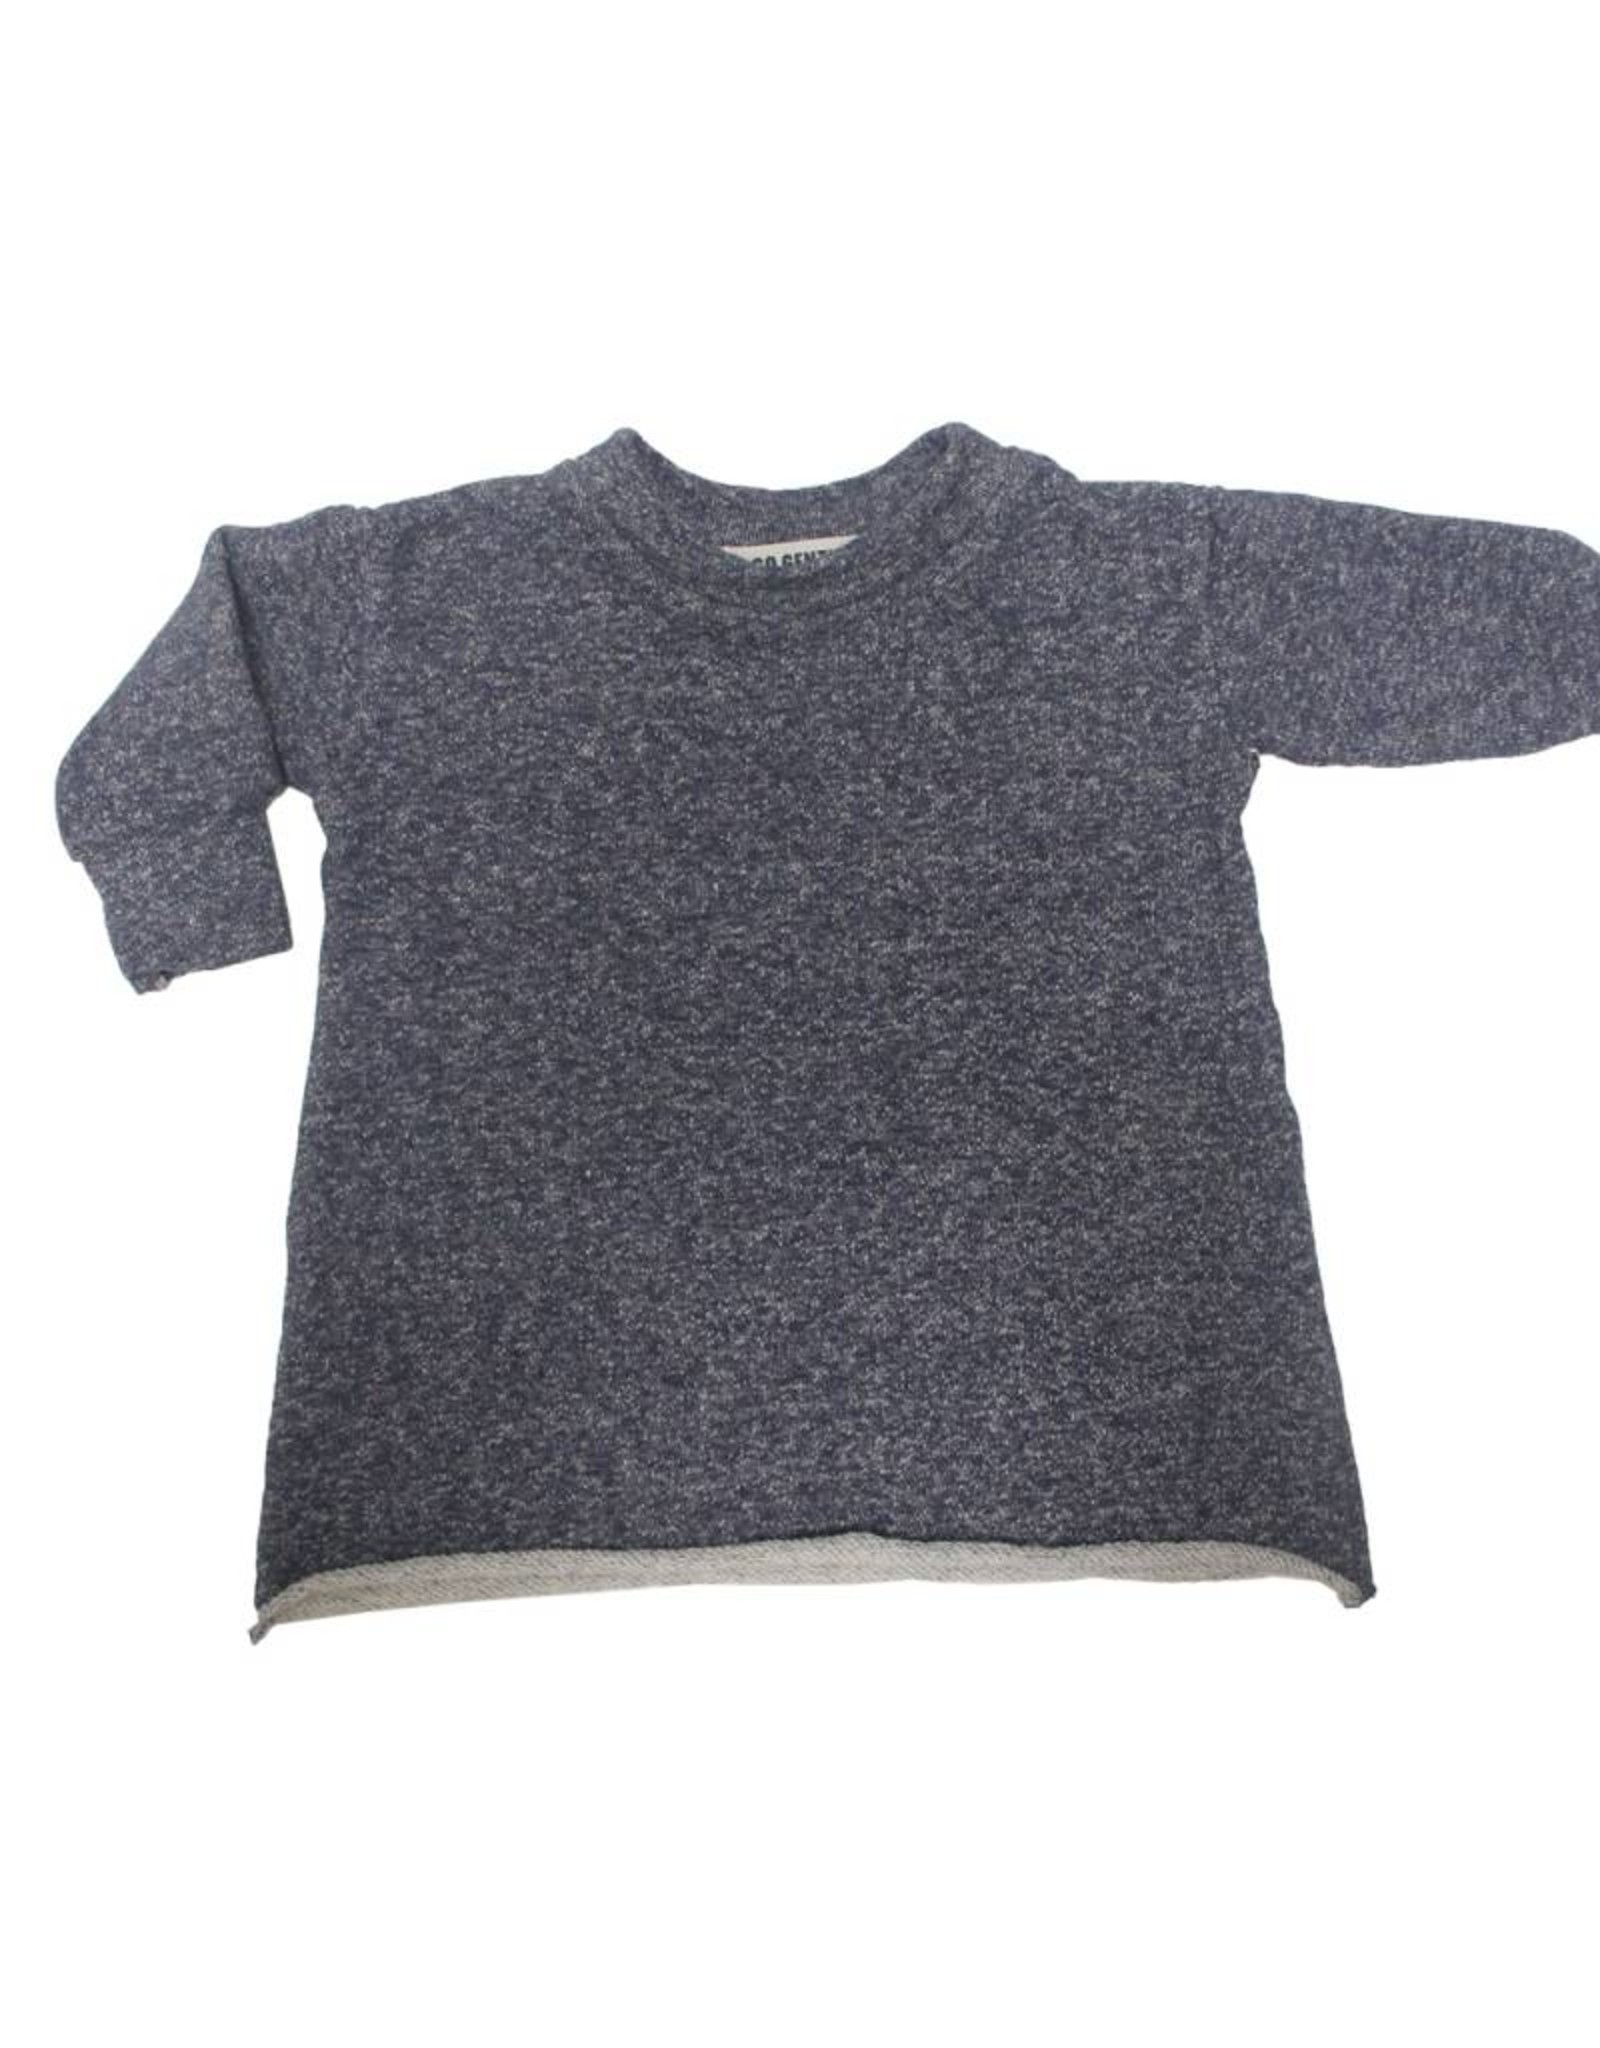 Go Gently Nation Hemp puff sleeve dress jogging